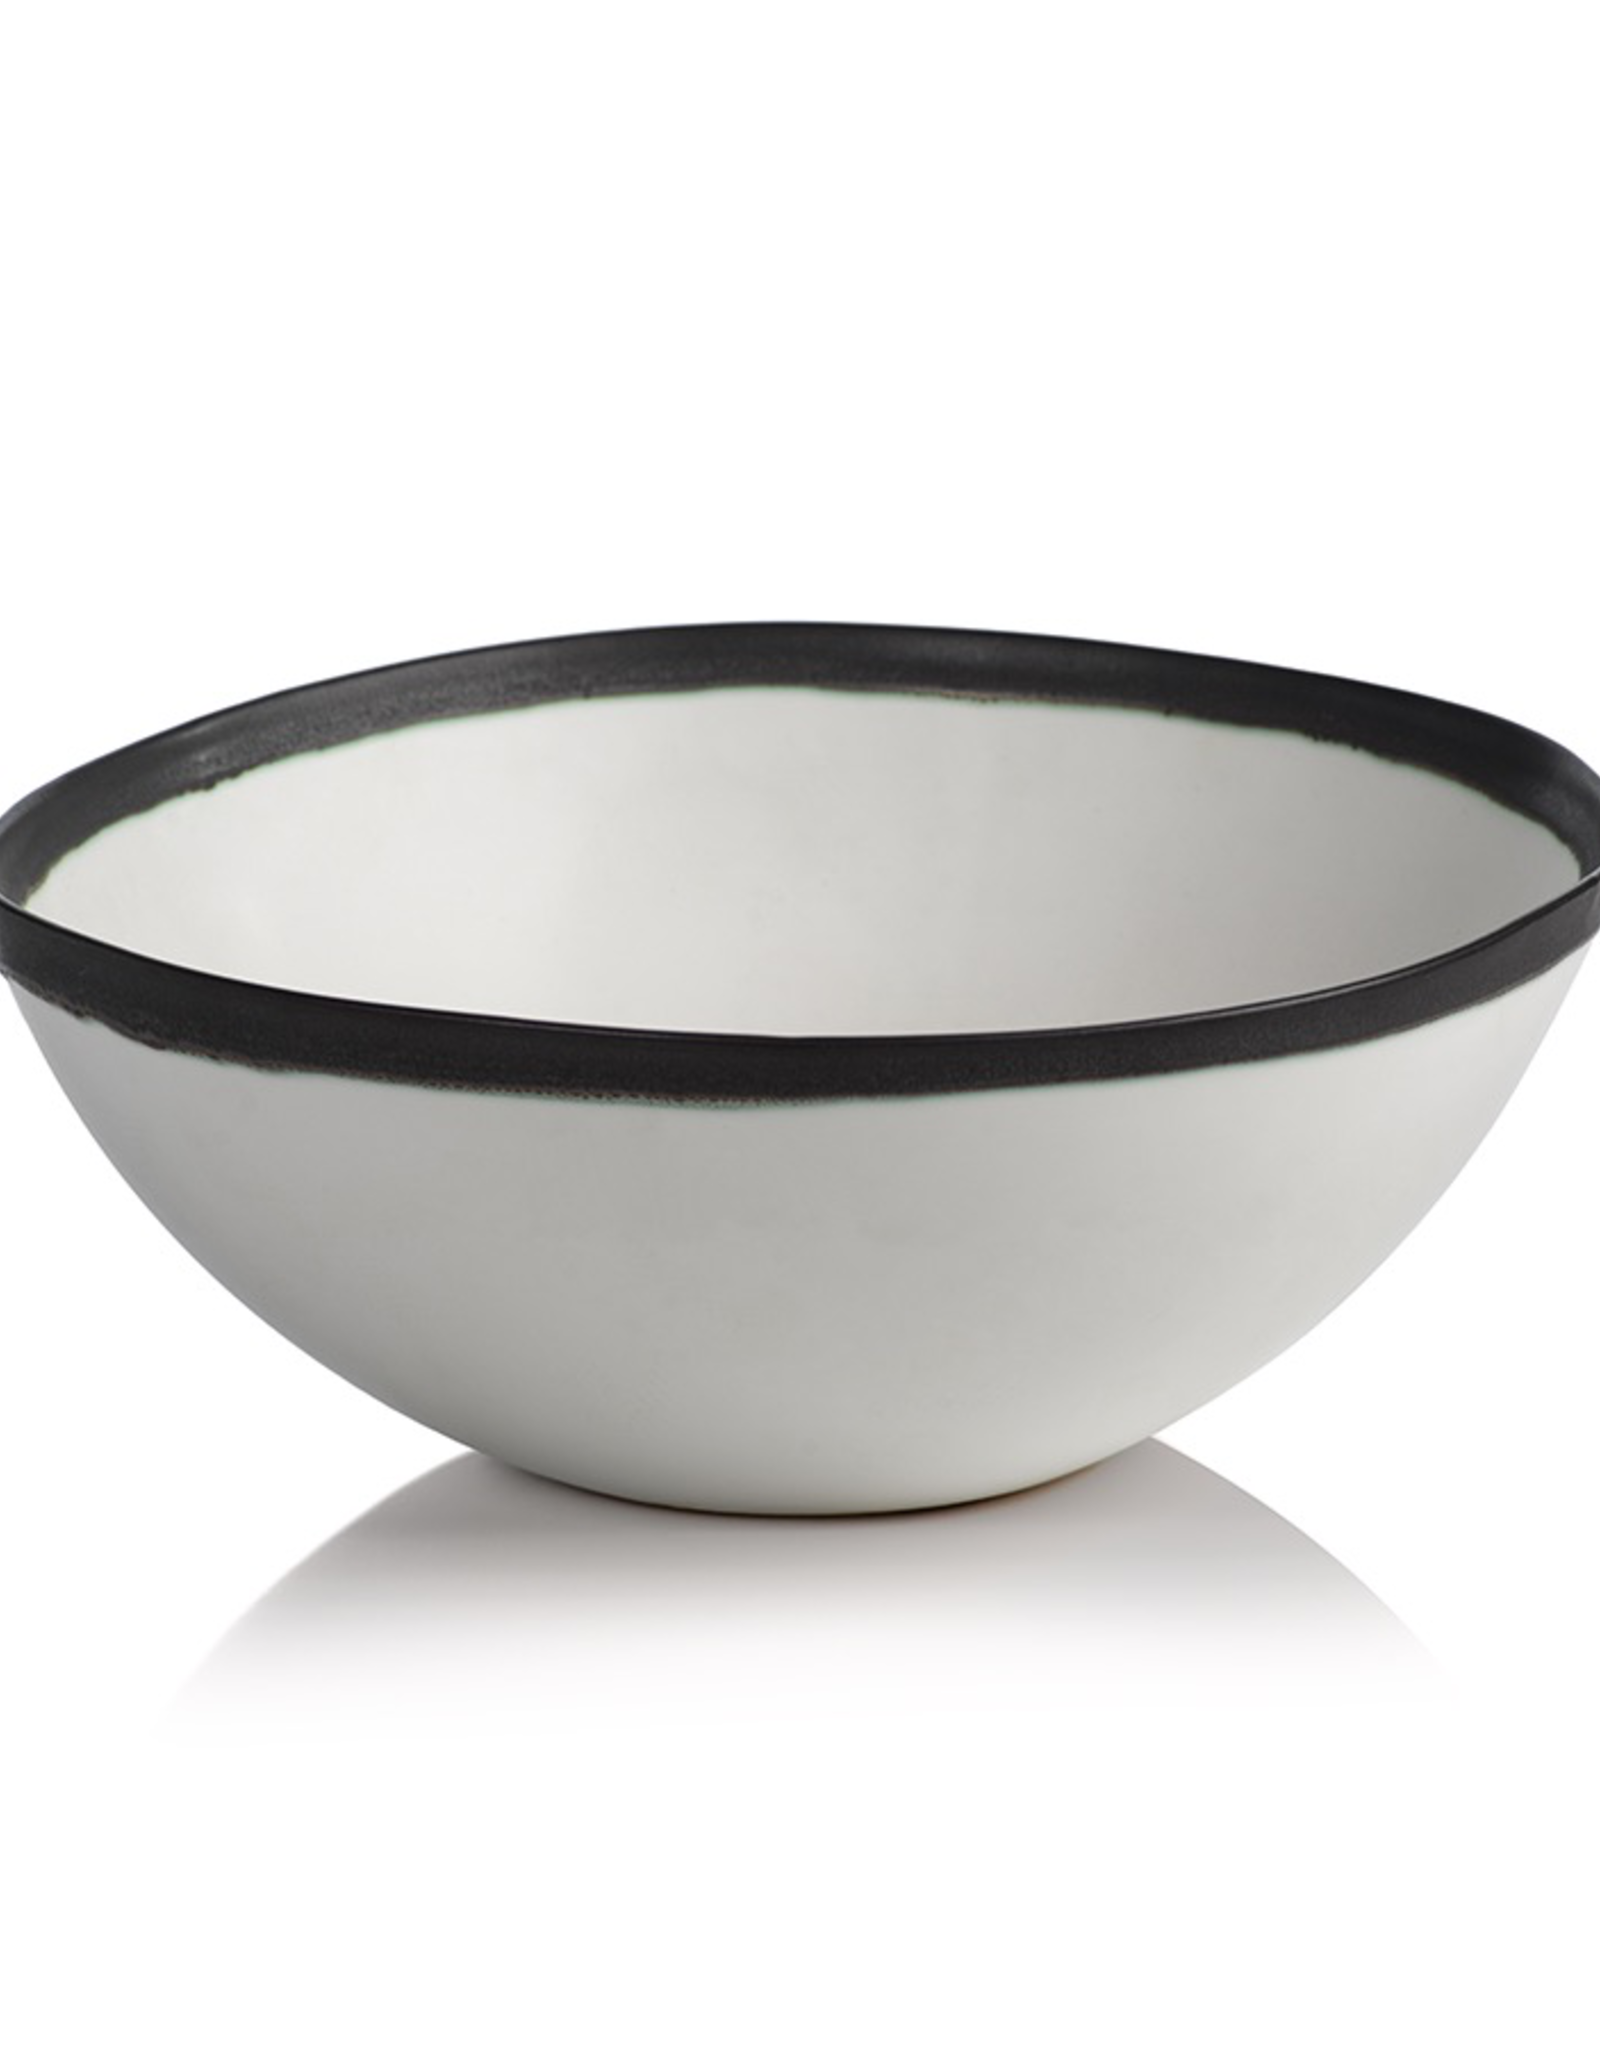 "Bowl, White with Black Rim, Ceramic, D 11.25"""